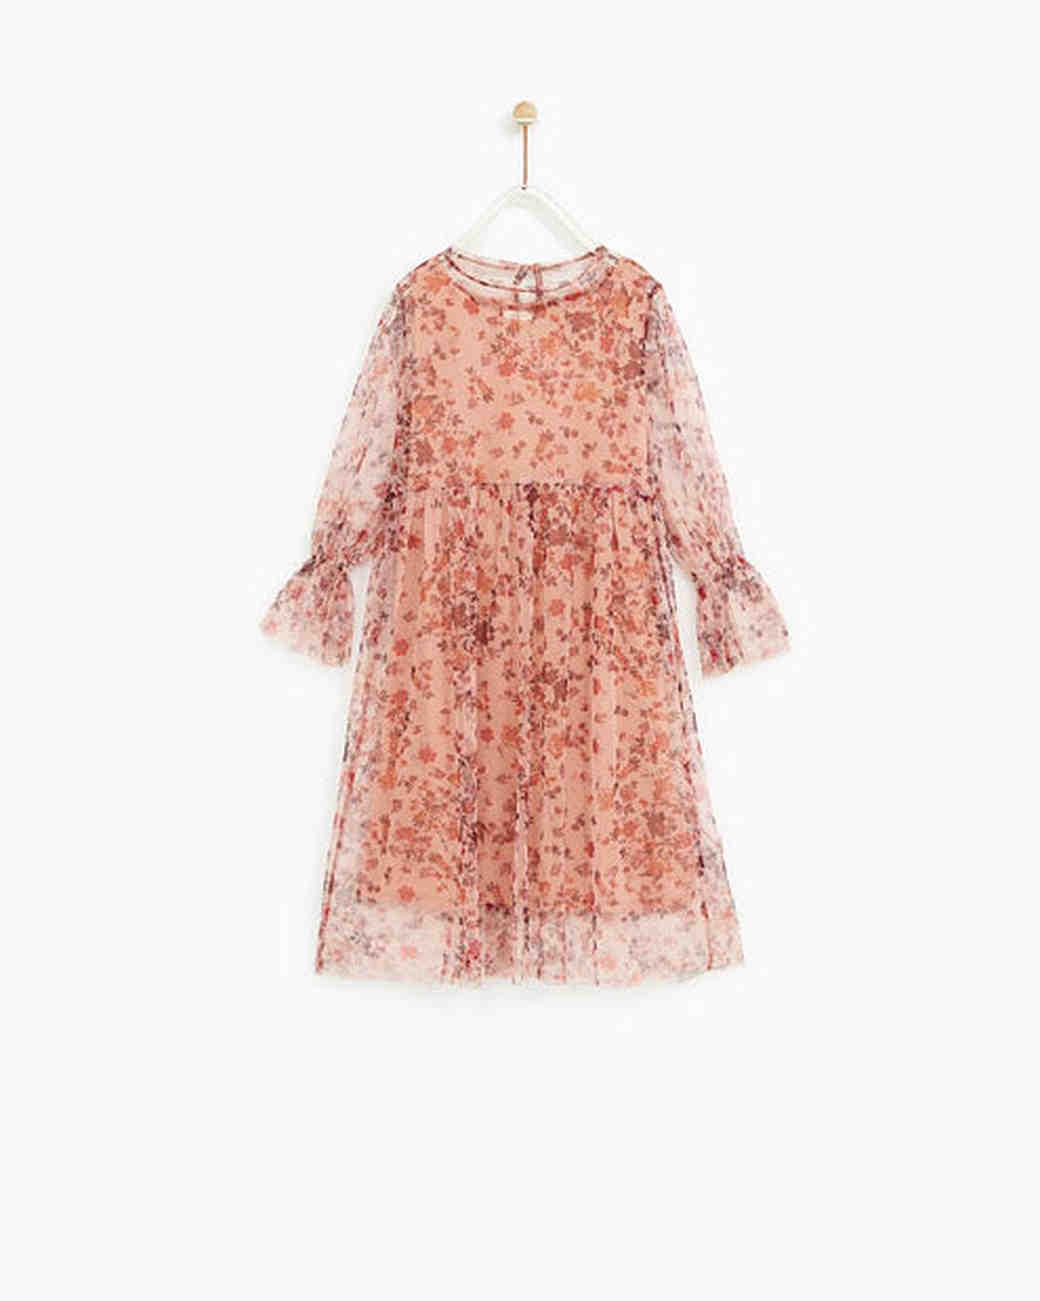 16616d85 The Prettiest Fall Flower Girl Dresses | Martha Stewart Weddings